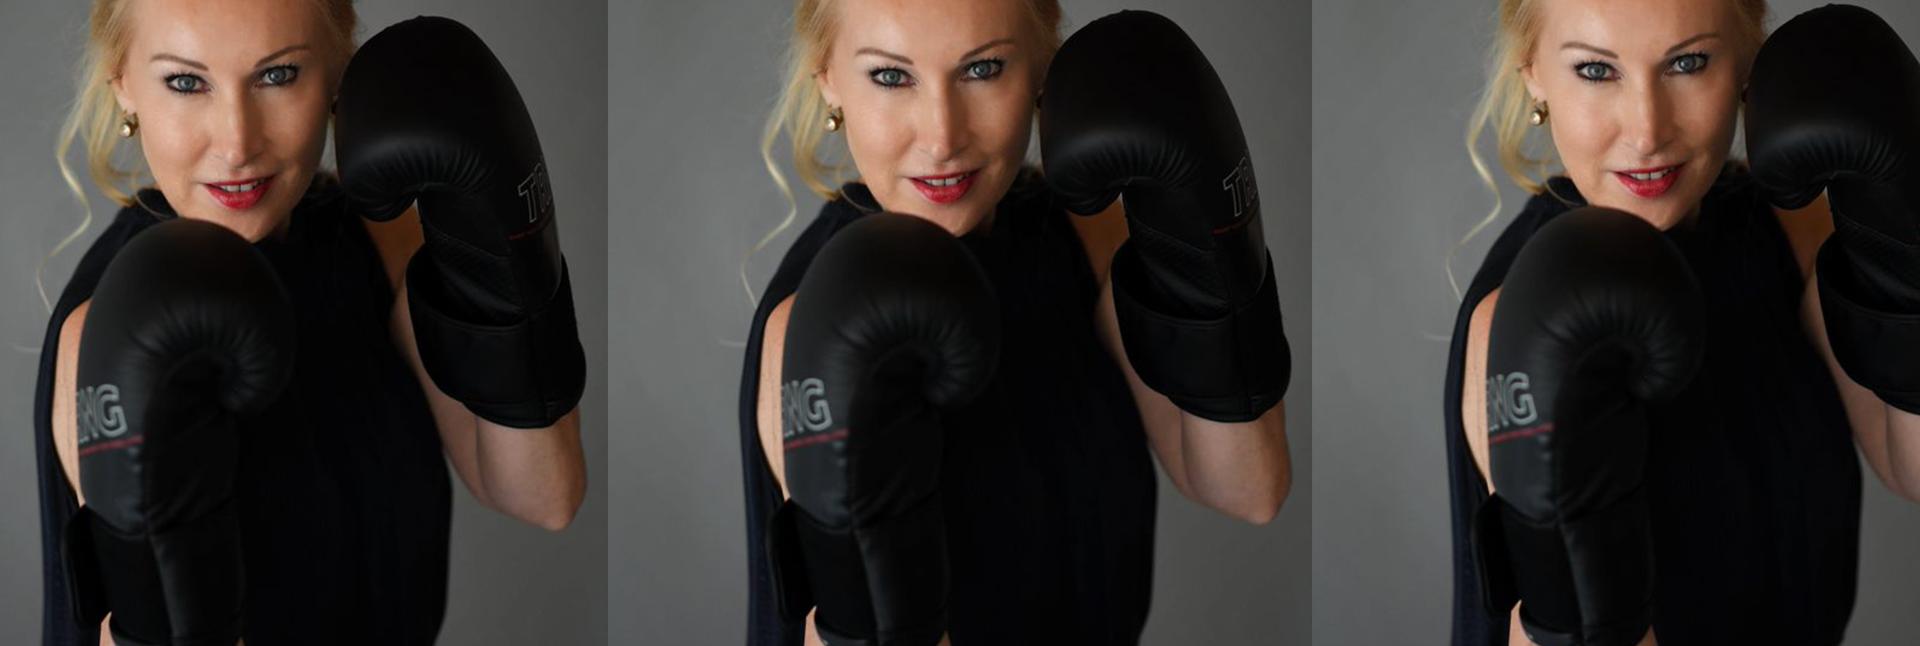 Ana boxingnew.png